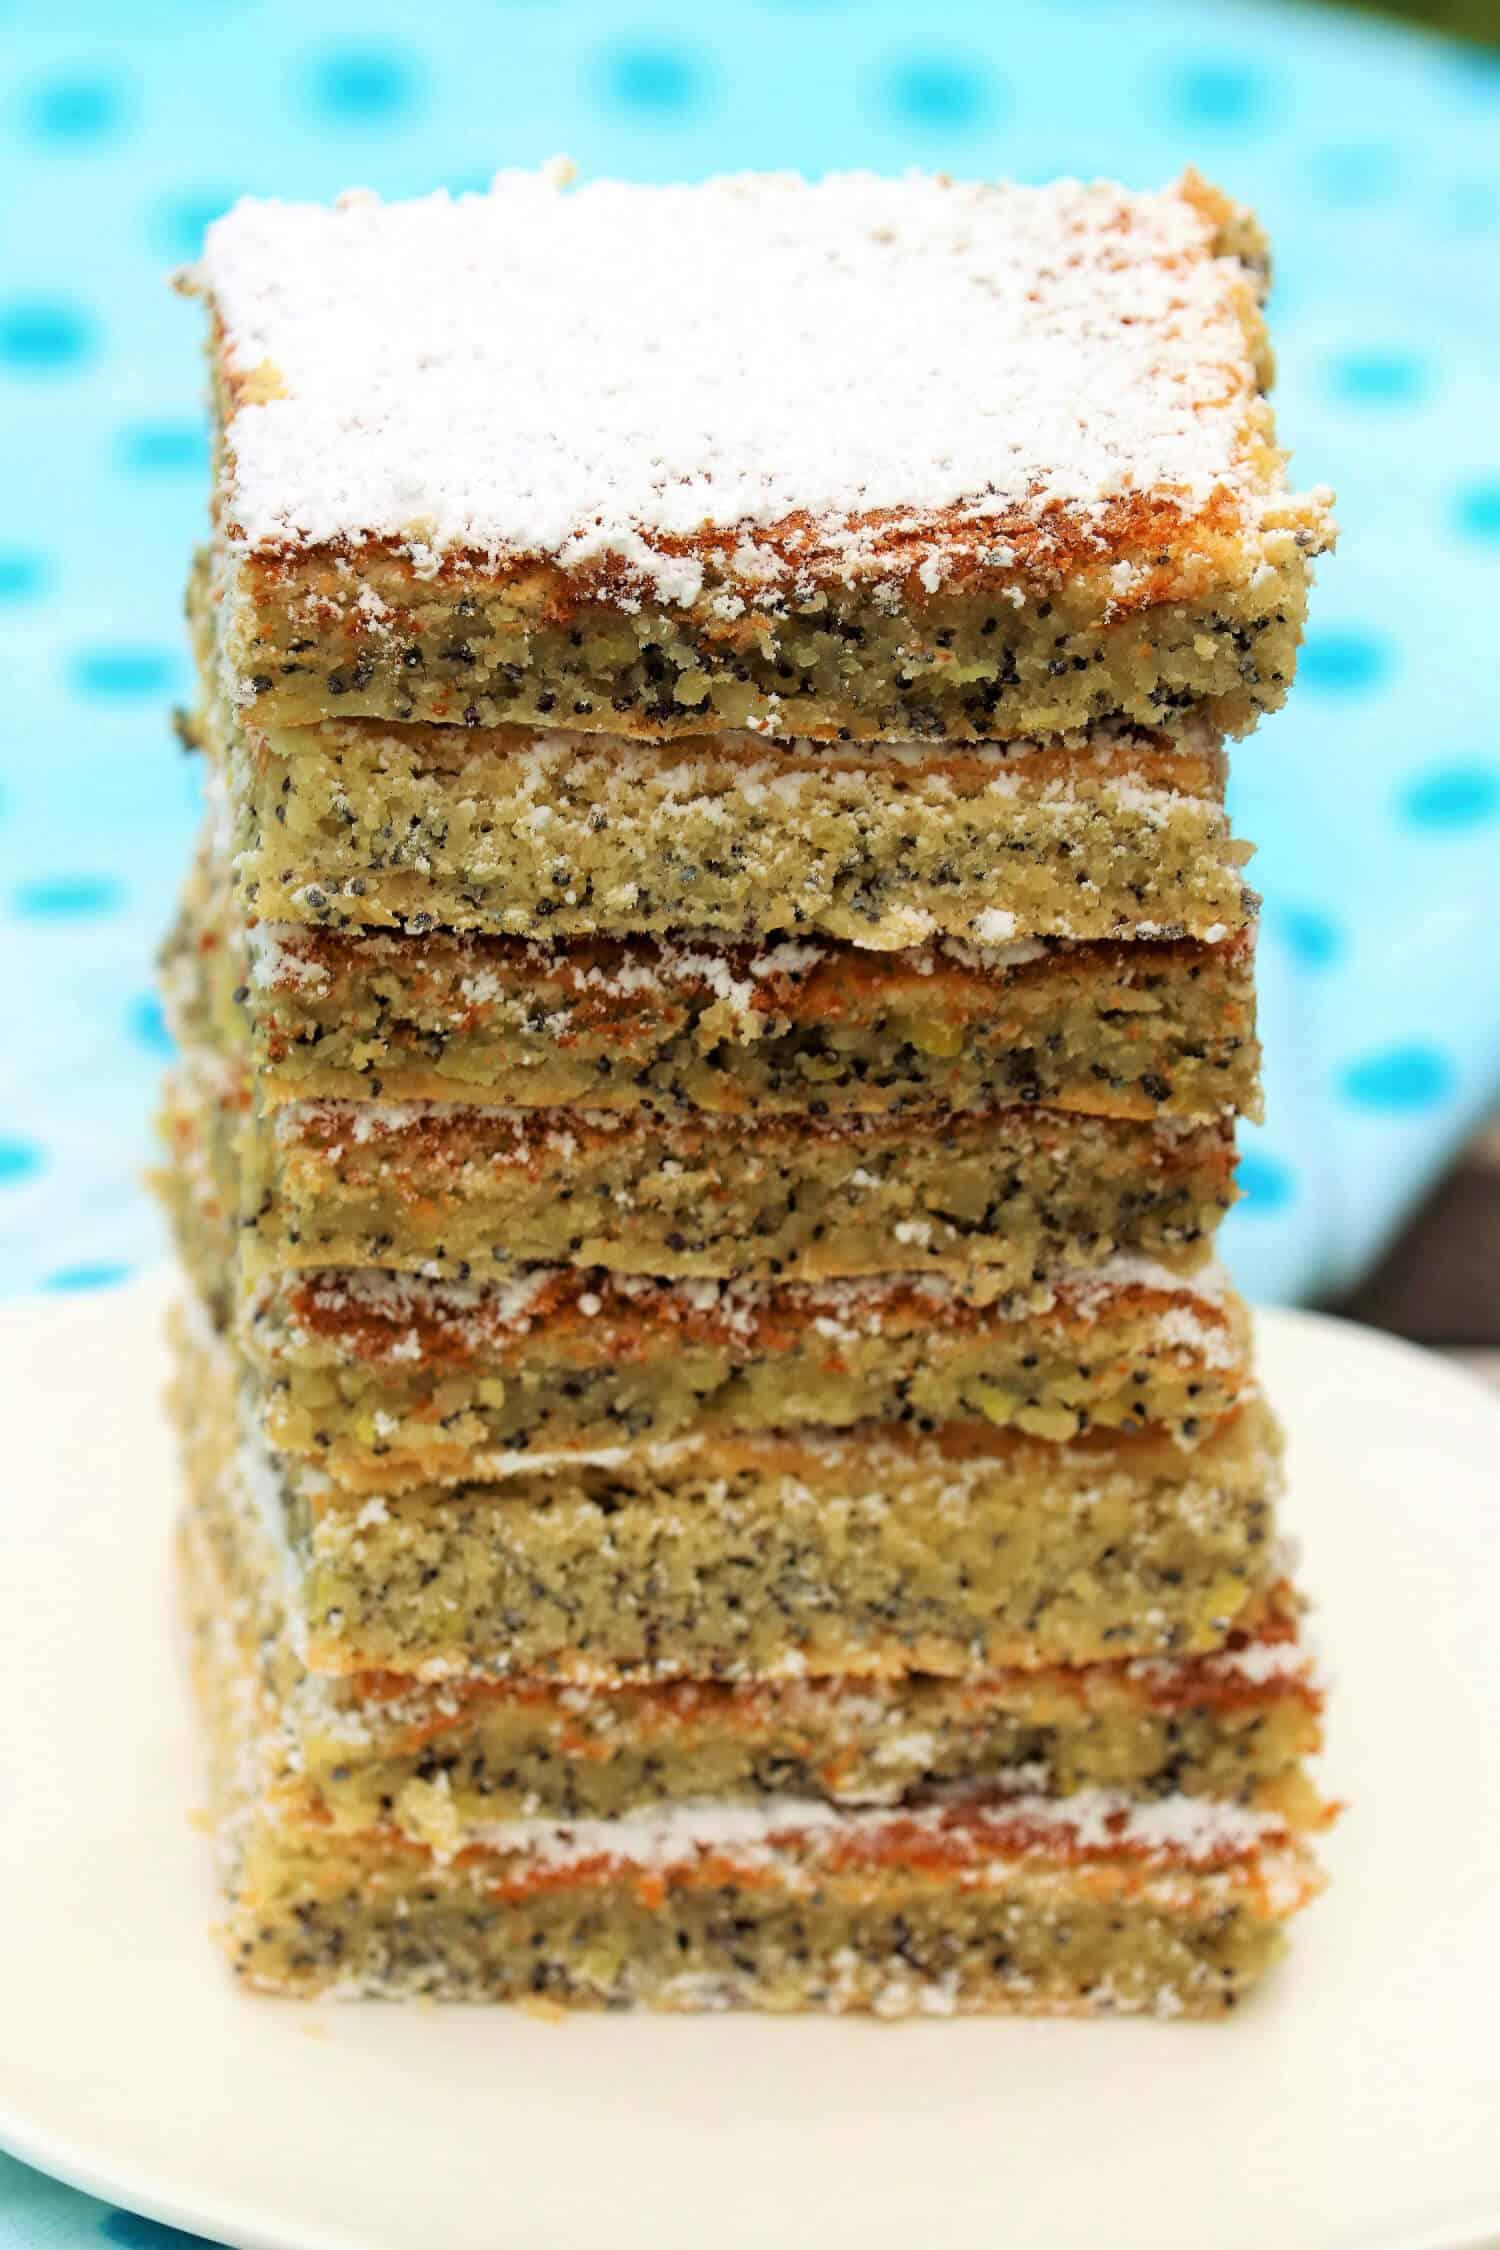 5 Zutaten Low Carb Mohnkuchen ohne Zucker backen